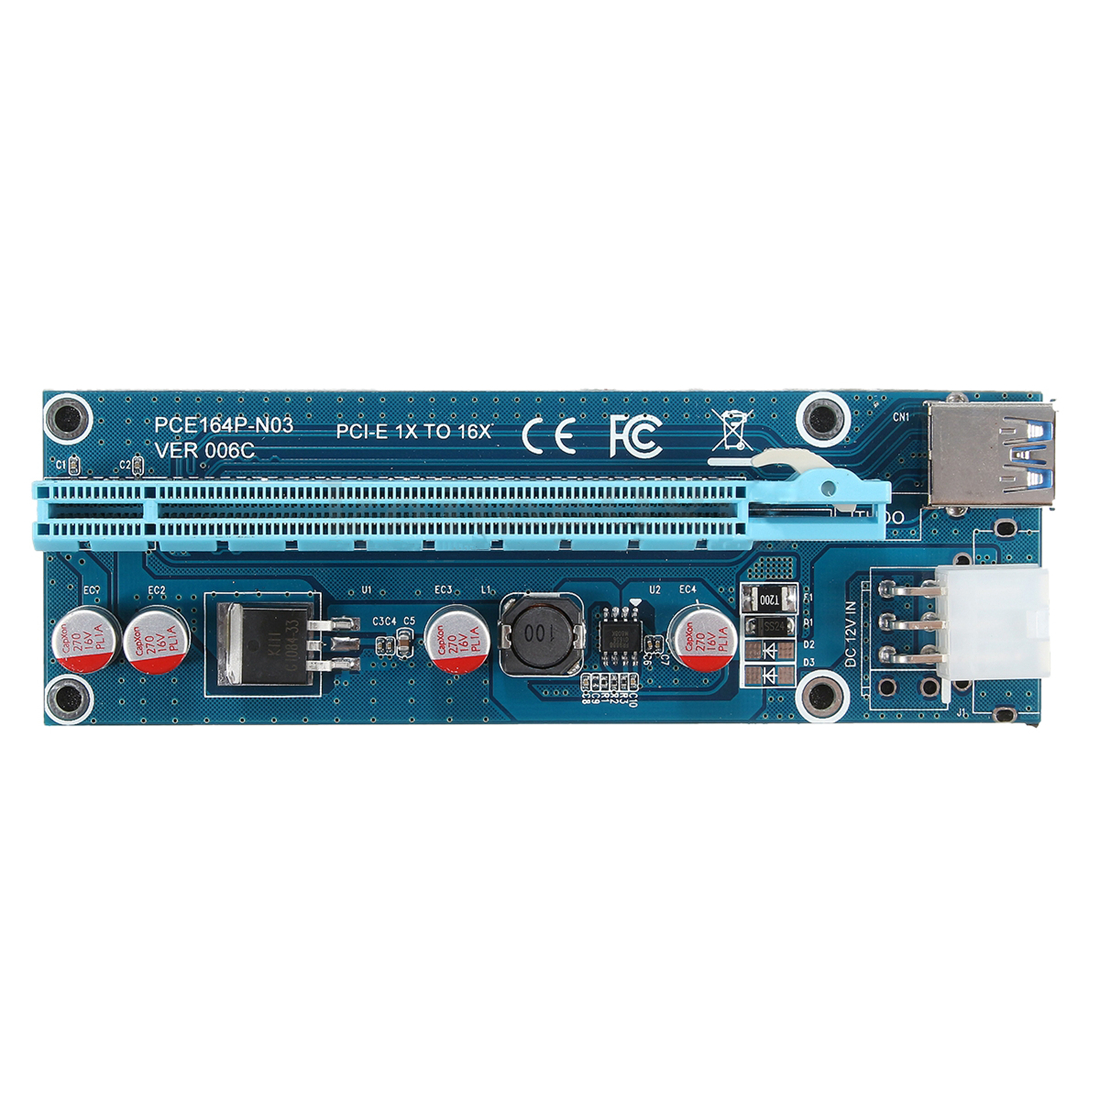 5Pcs USB3.0 PCI-E Express 1x To 16x Extender Riser Card Adapter SATA 15Pin-4Pin Cable Blue